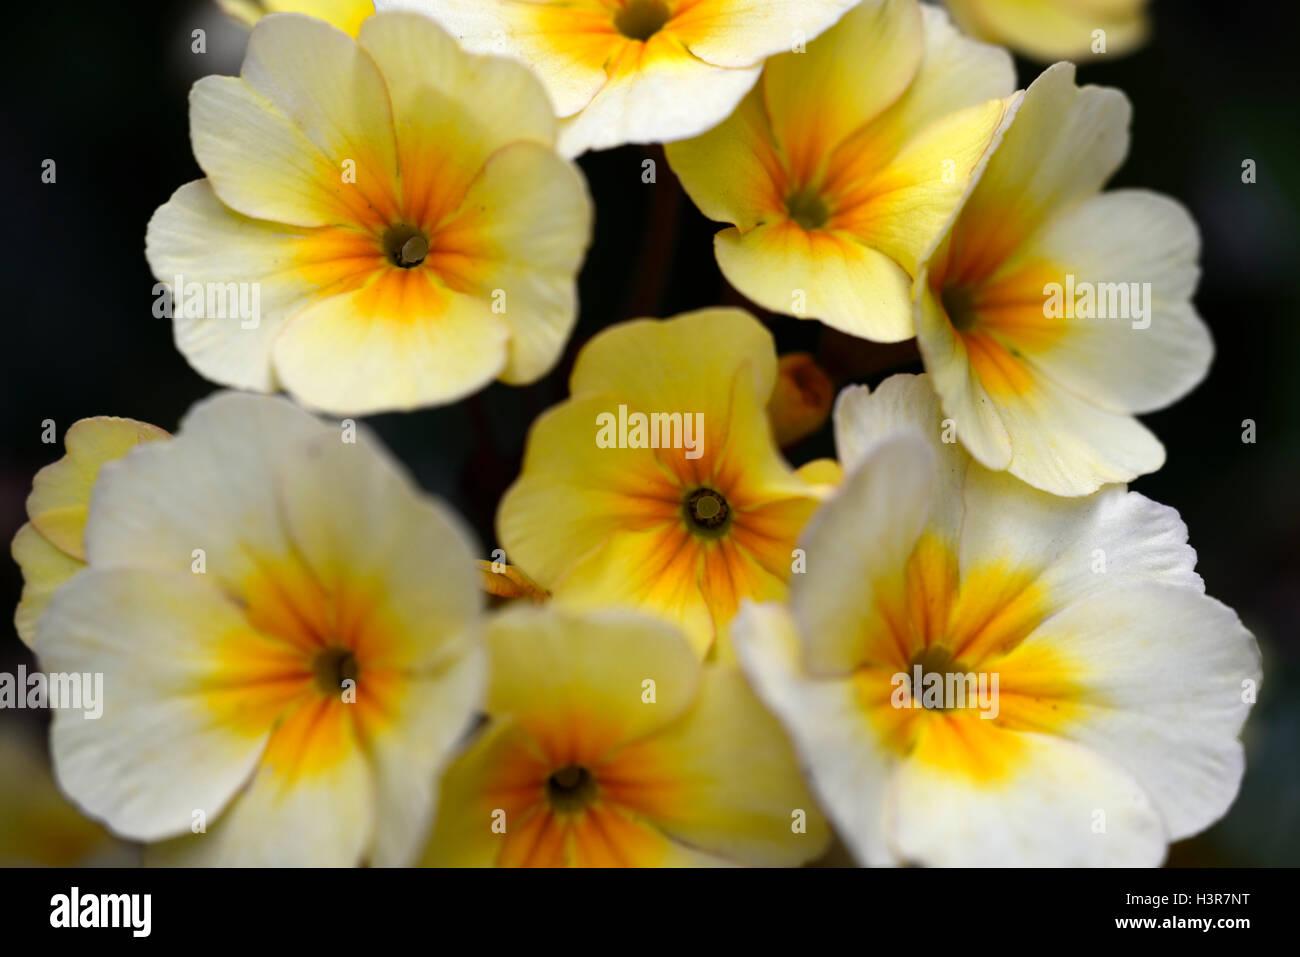 Primula goldnugget yellow primrose primroses spring flower flowers primula goldnugget yellow primrose primroses spring flower flowers flowering rm floral mightylinksfo